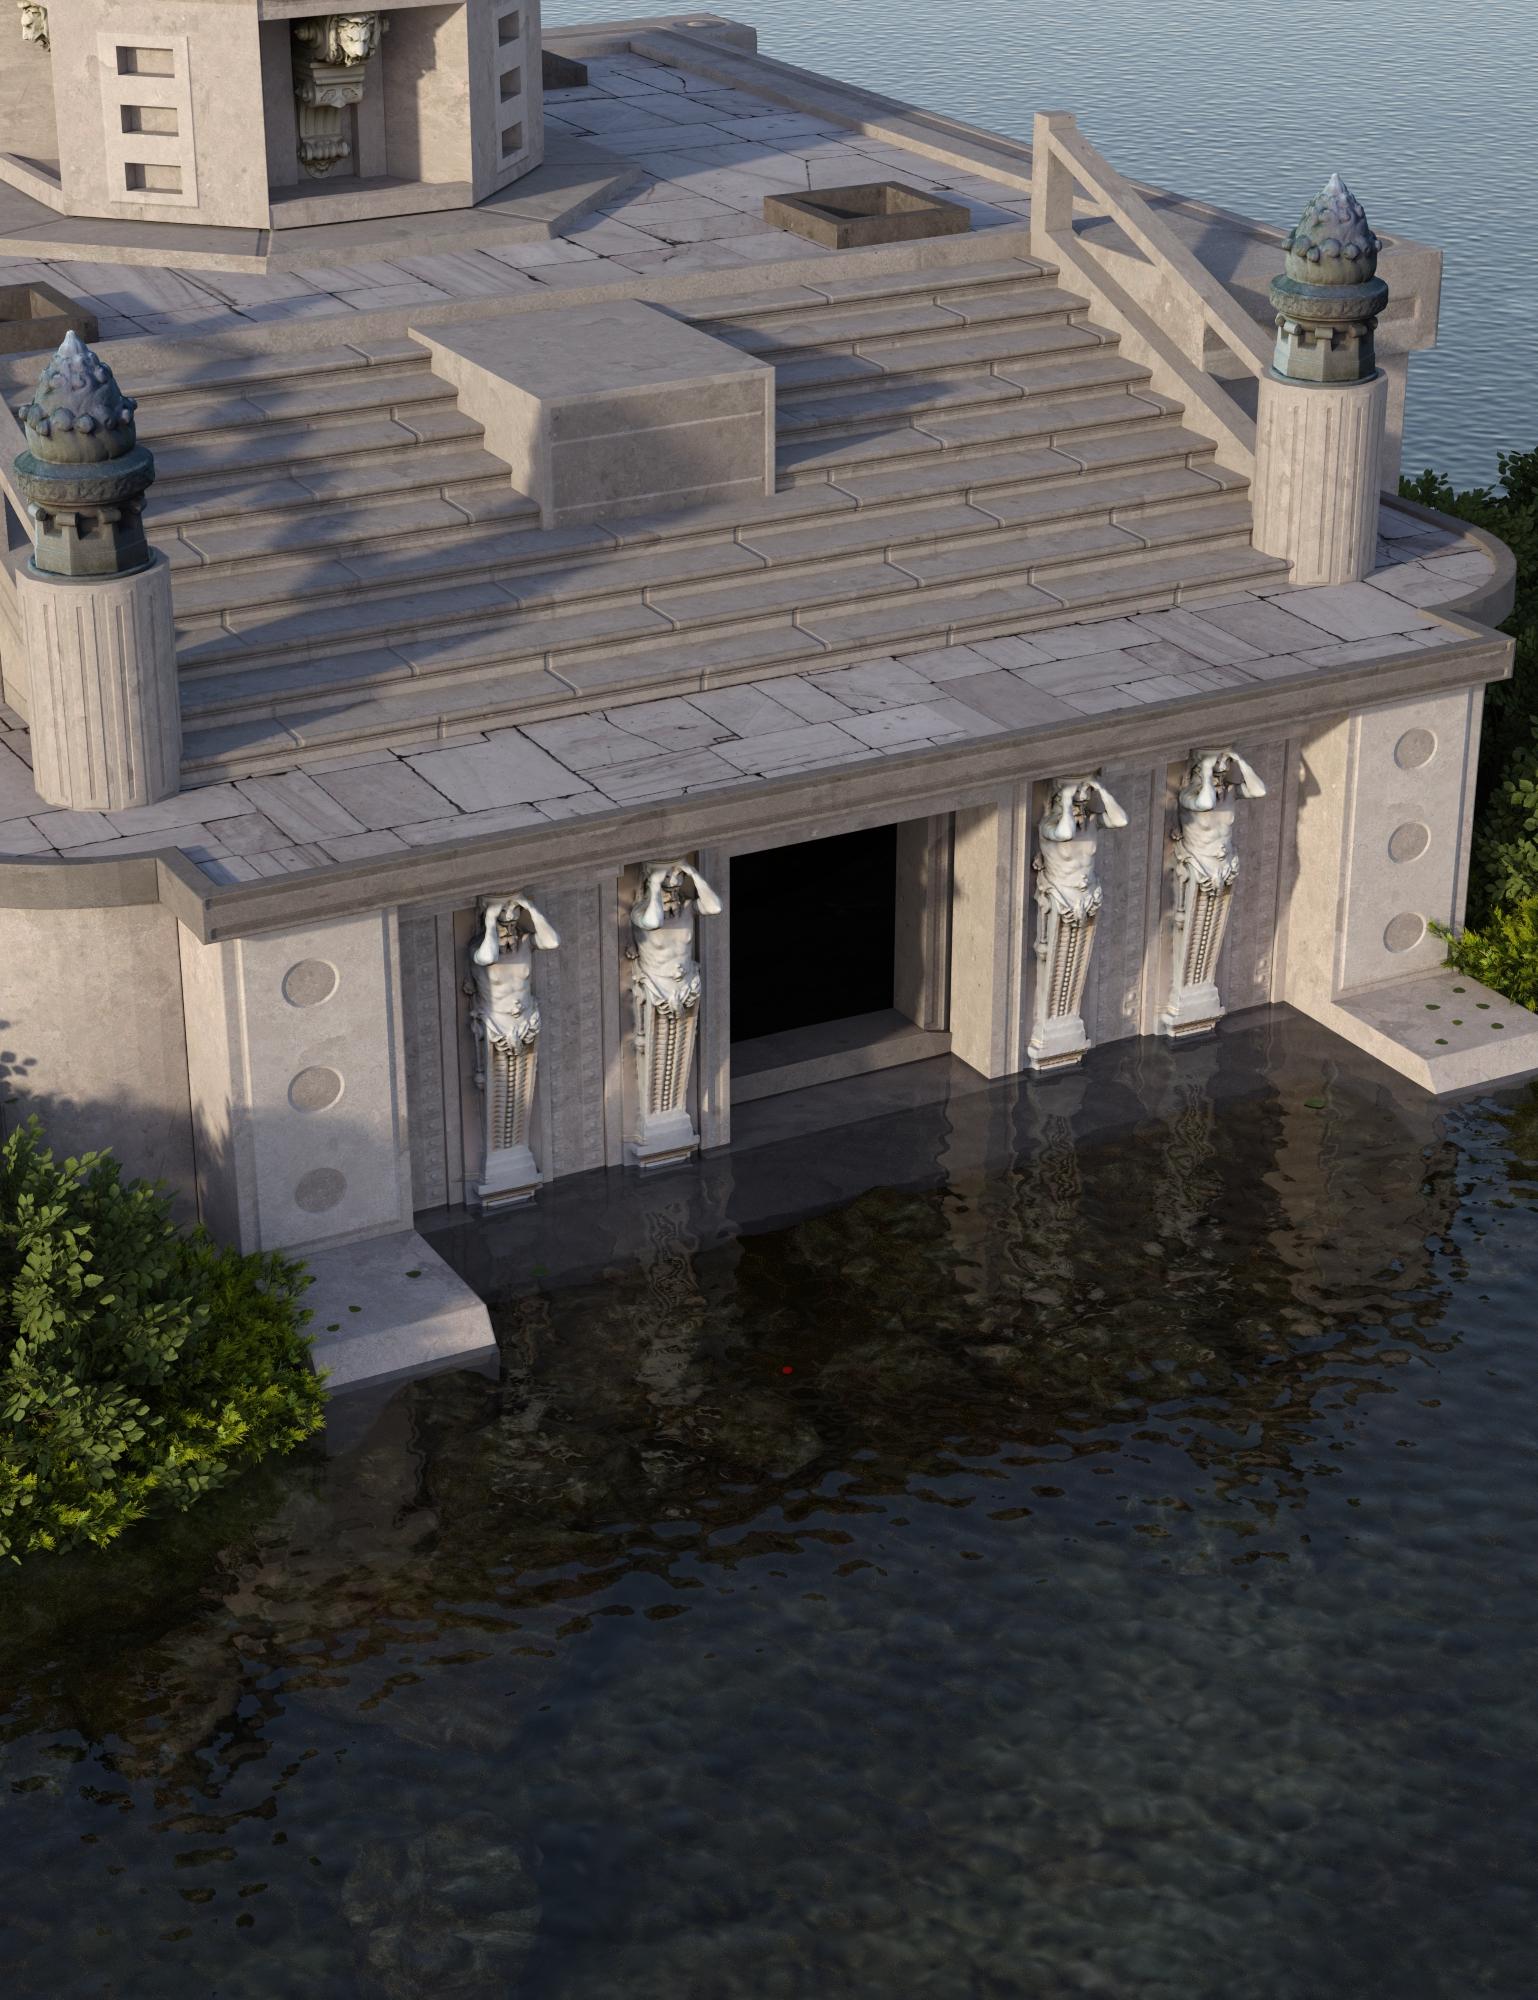 The Isle of Mythos by: Oskarsson, 3D Models by Daz 3D